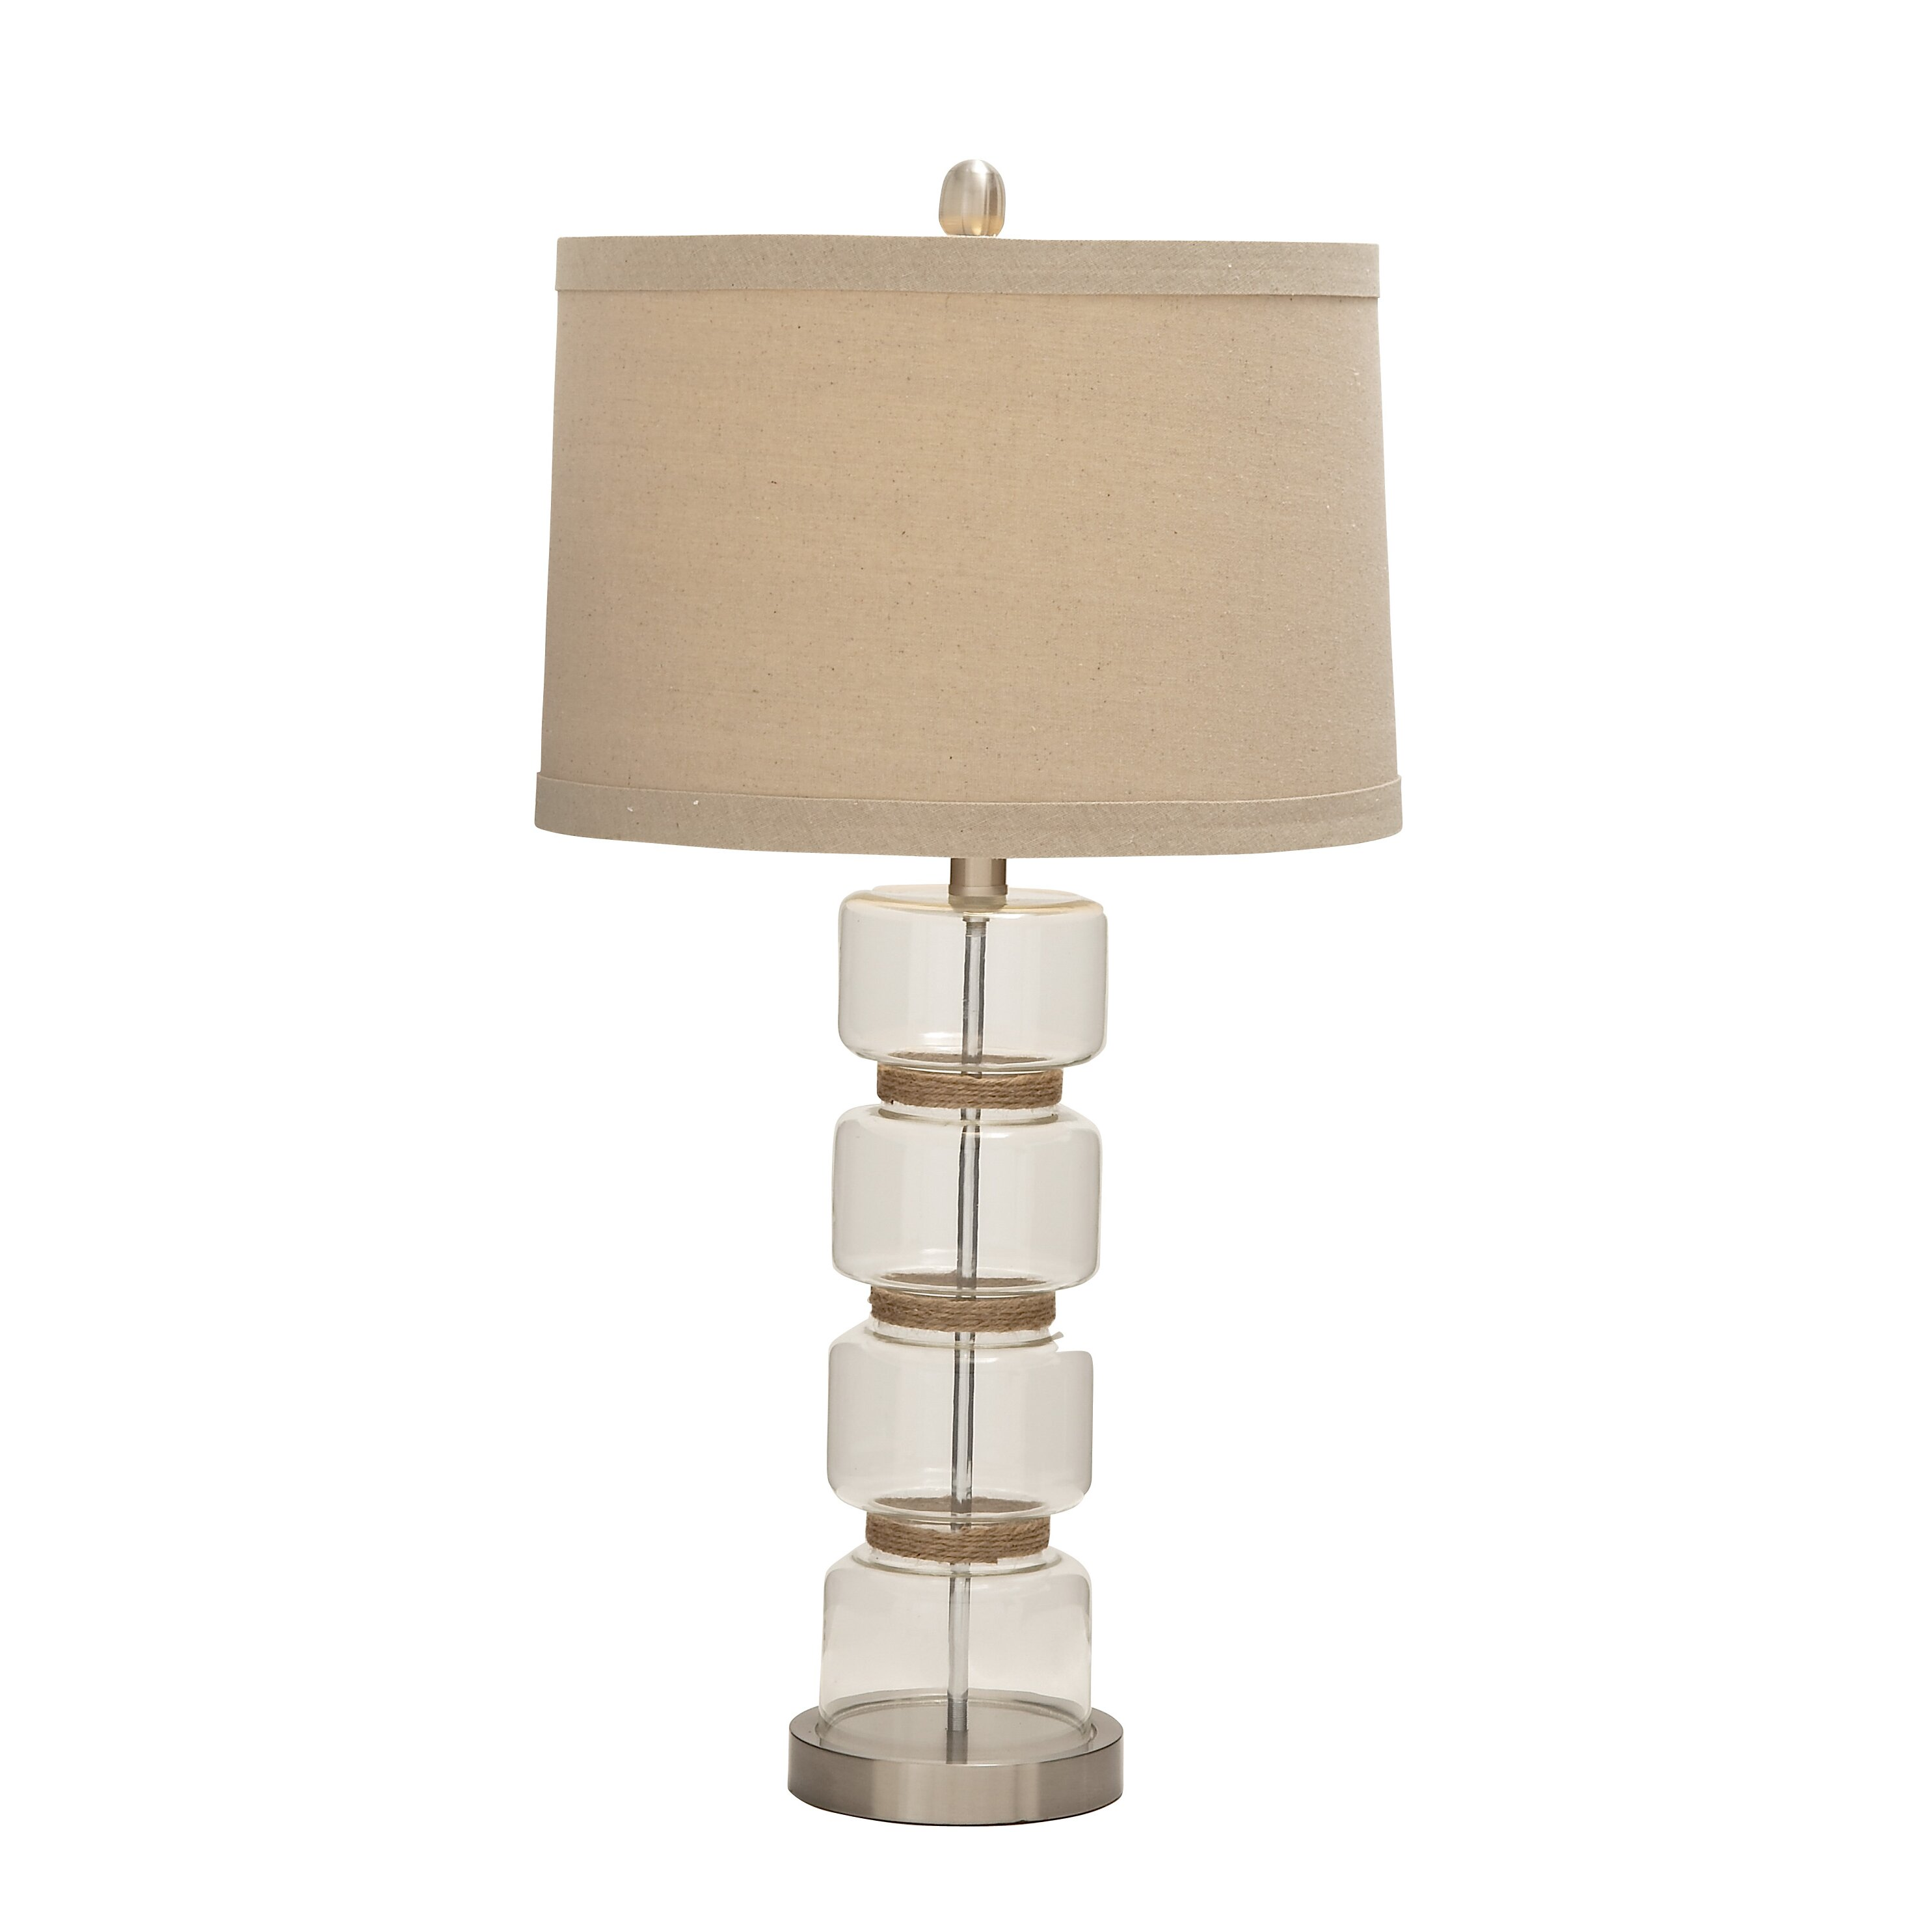 Jute Ceiling Lamp Shade: Woodland Imports Nature Themed Splendid Glass Metal Jute